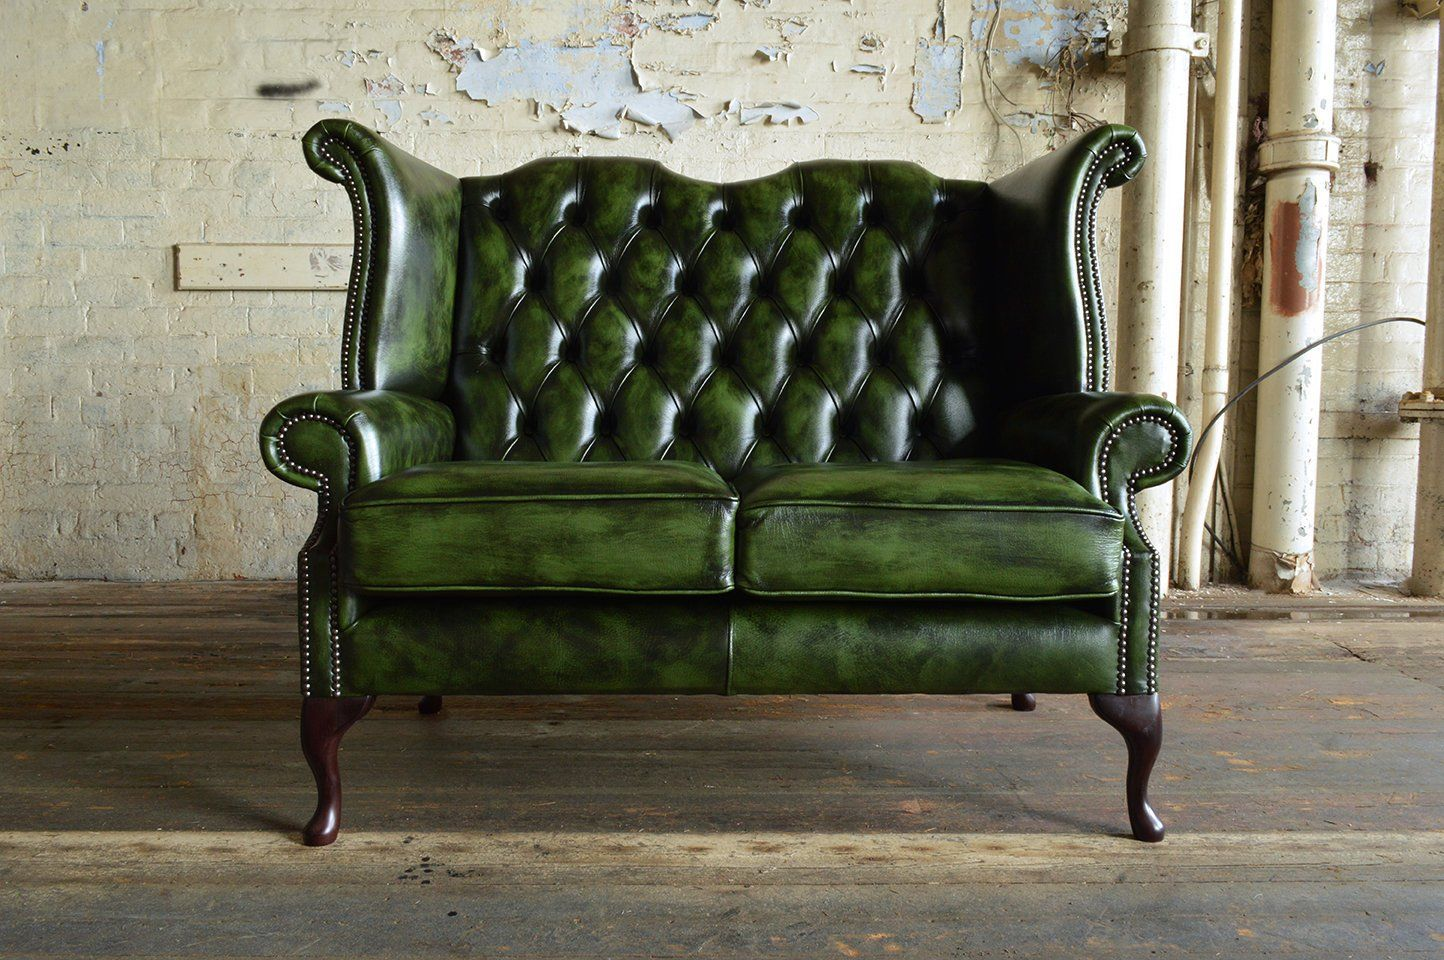 British Handmade Antique Green Leather